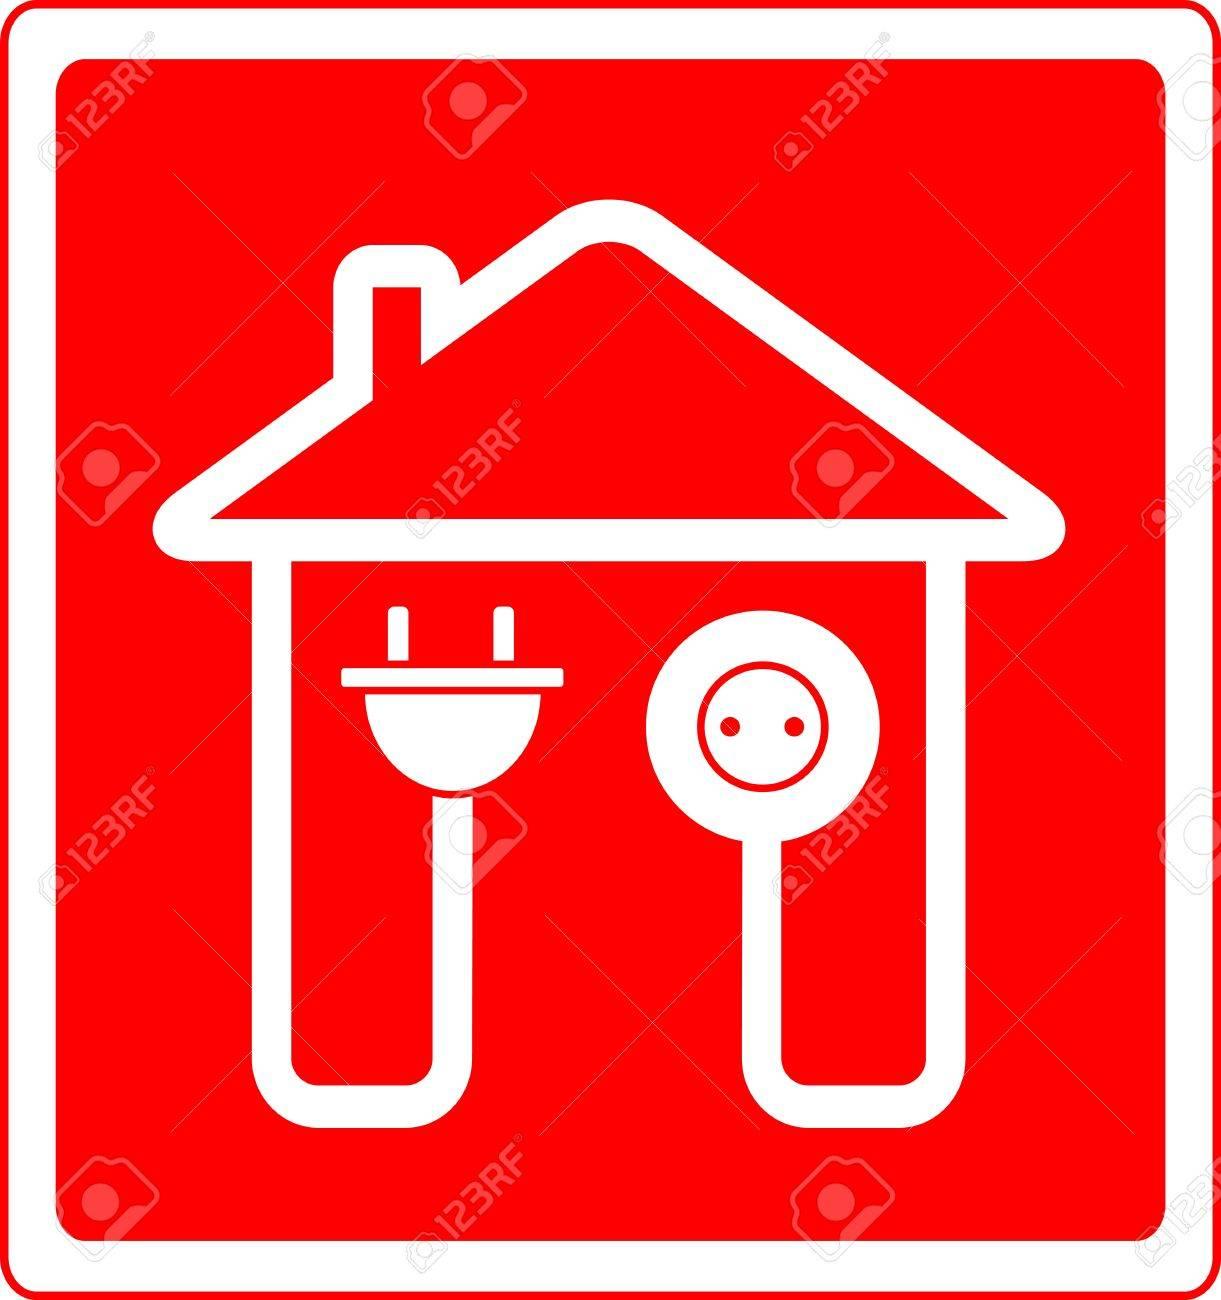 Plug Electrical Symbol